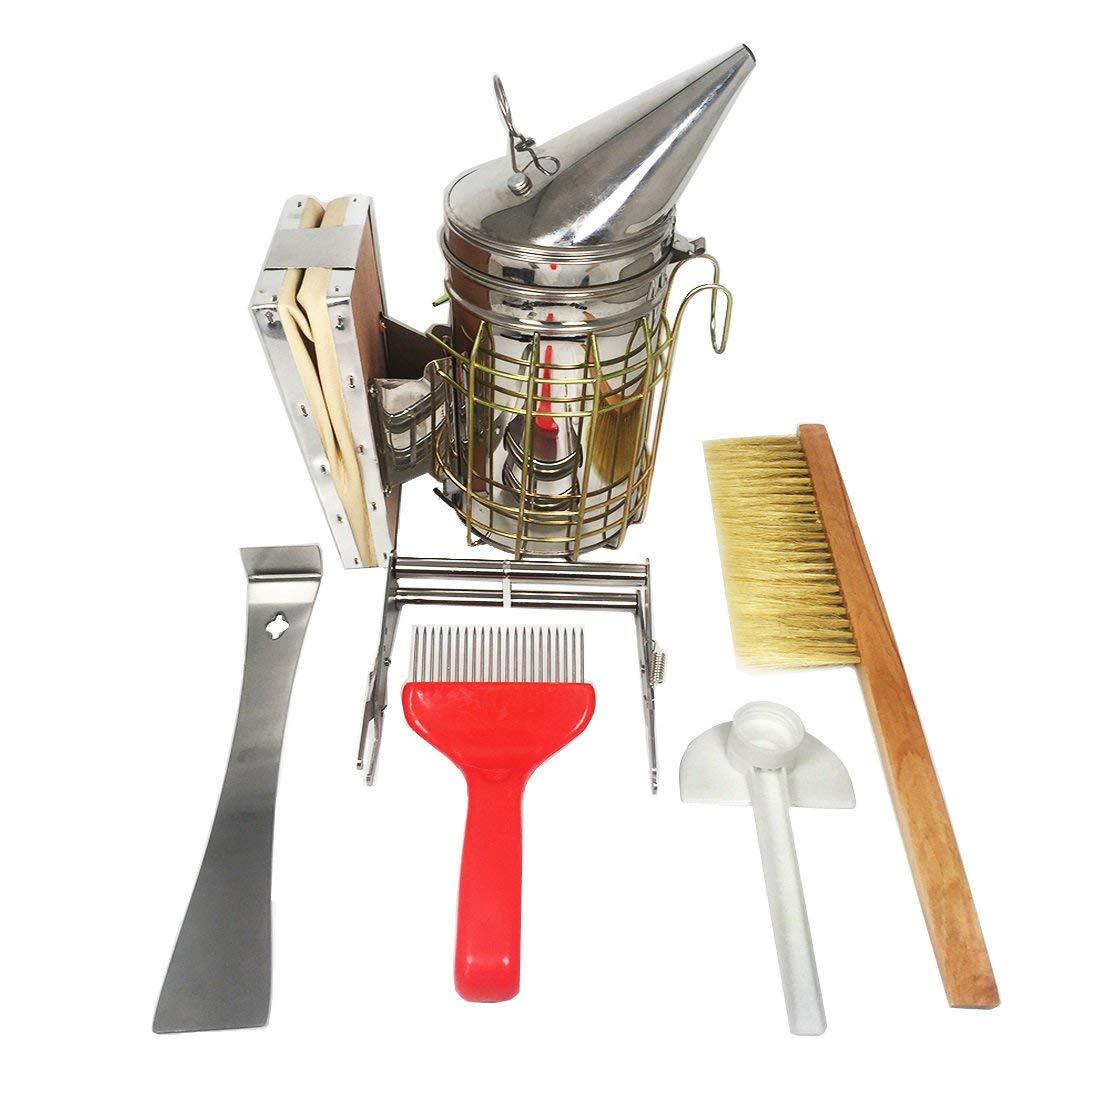 NAVAdeal Set of 6 Beekeeping Tools Starter Kit - Stainless Steel Bee Hive Smoker, Uncapping Fork Scratcher, Scraper, Brush, Feeder, Frame Grip - Great Handy Functional Equipment for Beekeeper Beginner by NAVADEAL